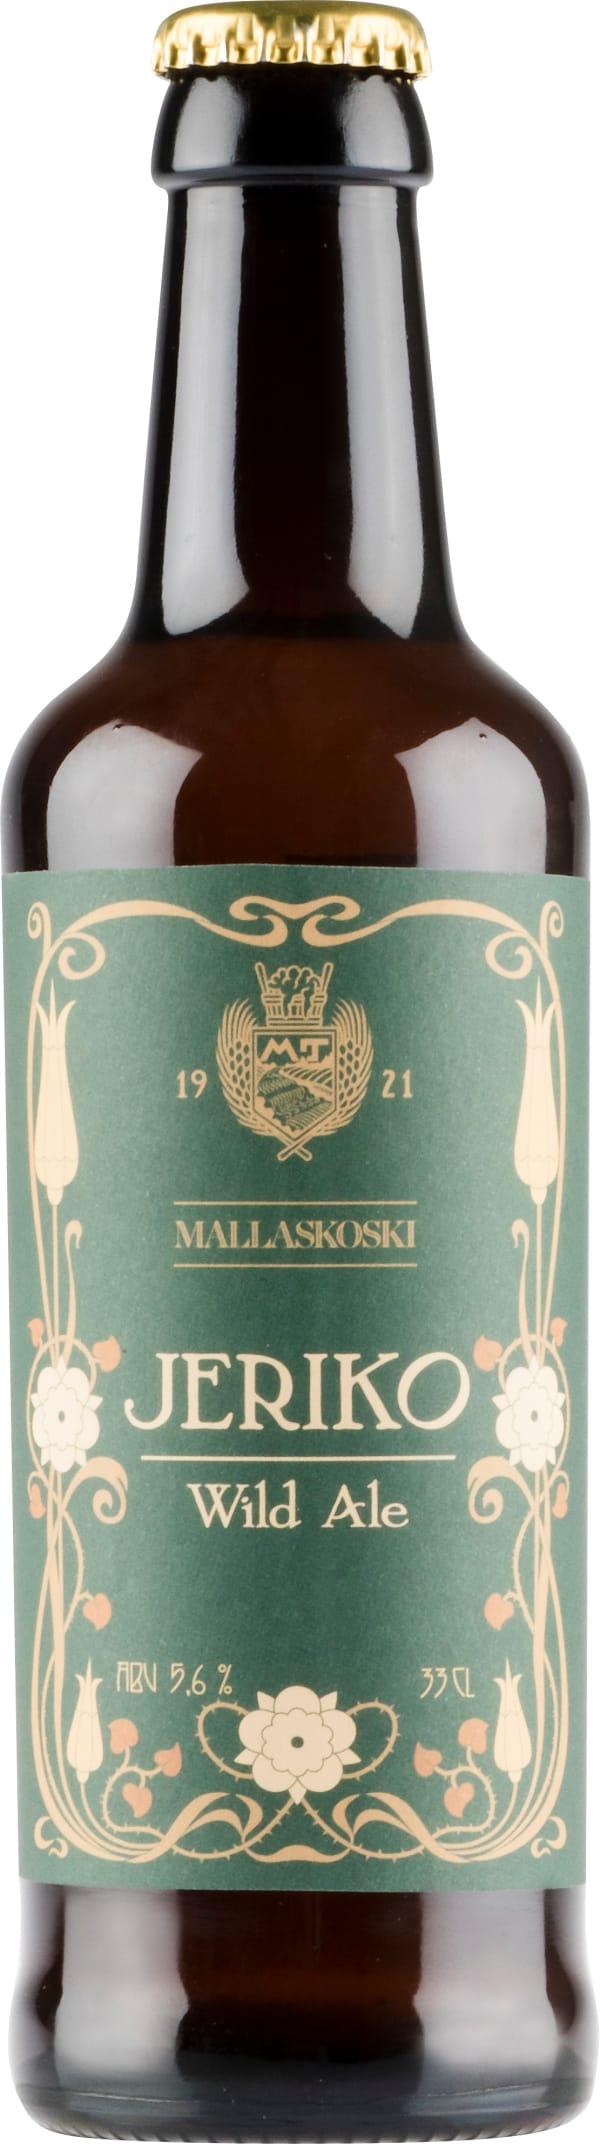 Mallaskoski Jeriko Wild Ale